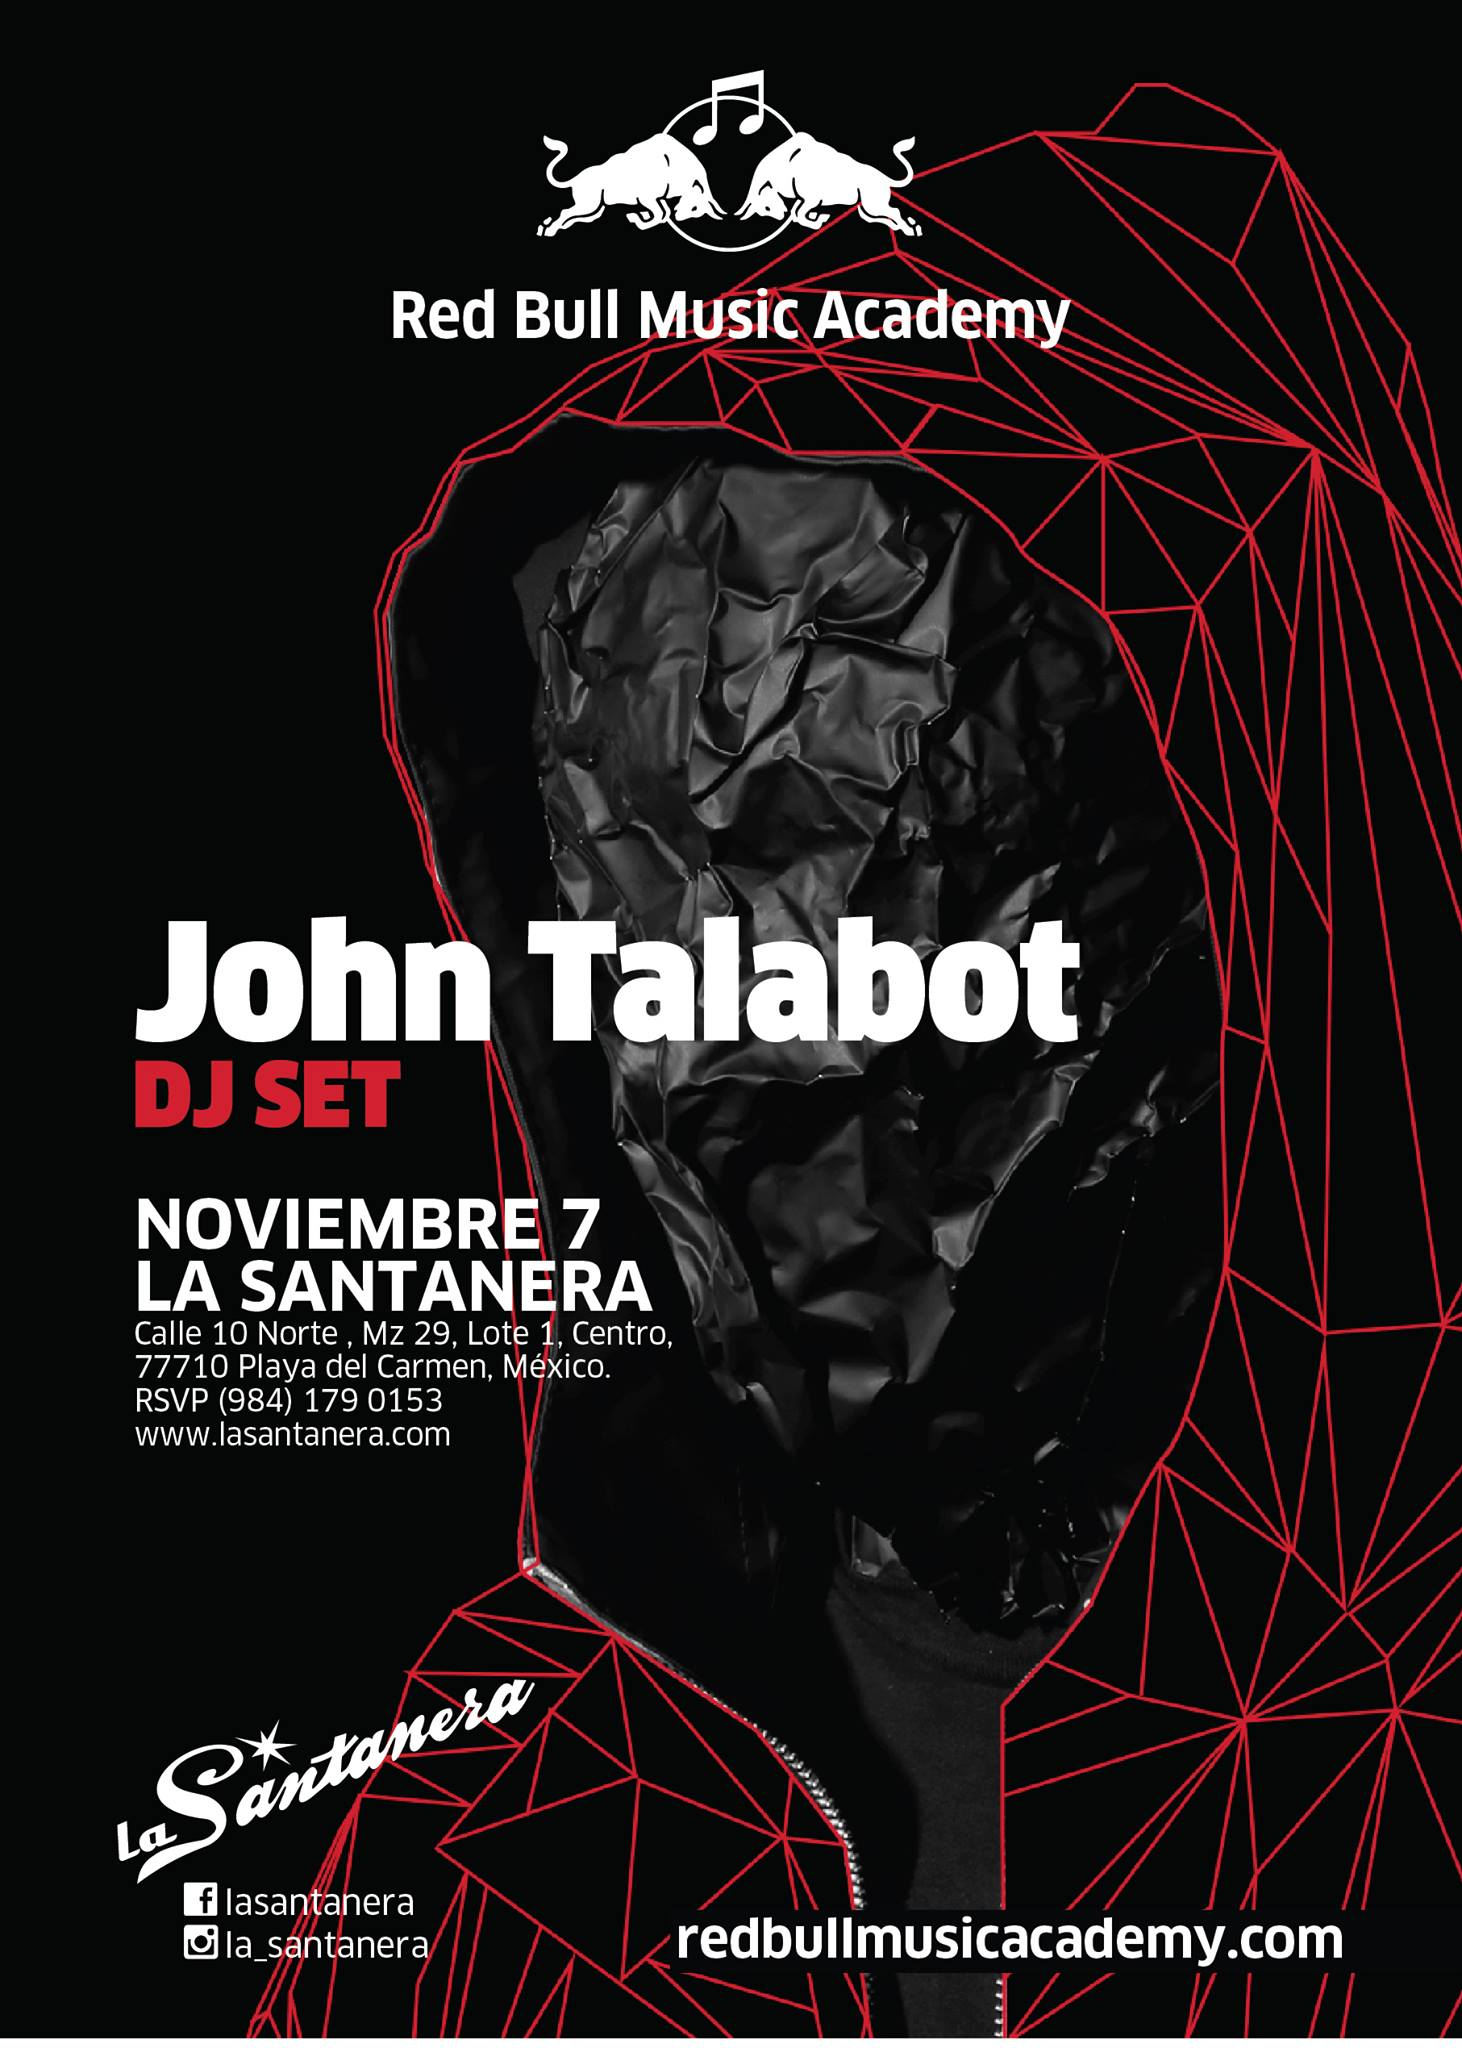 John Talabot @ La Santanera